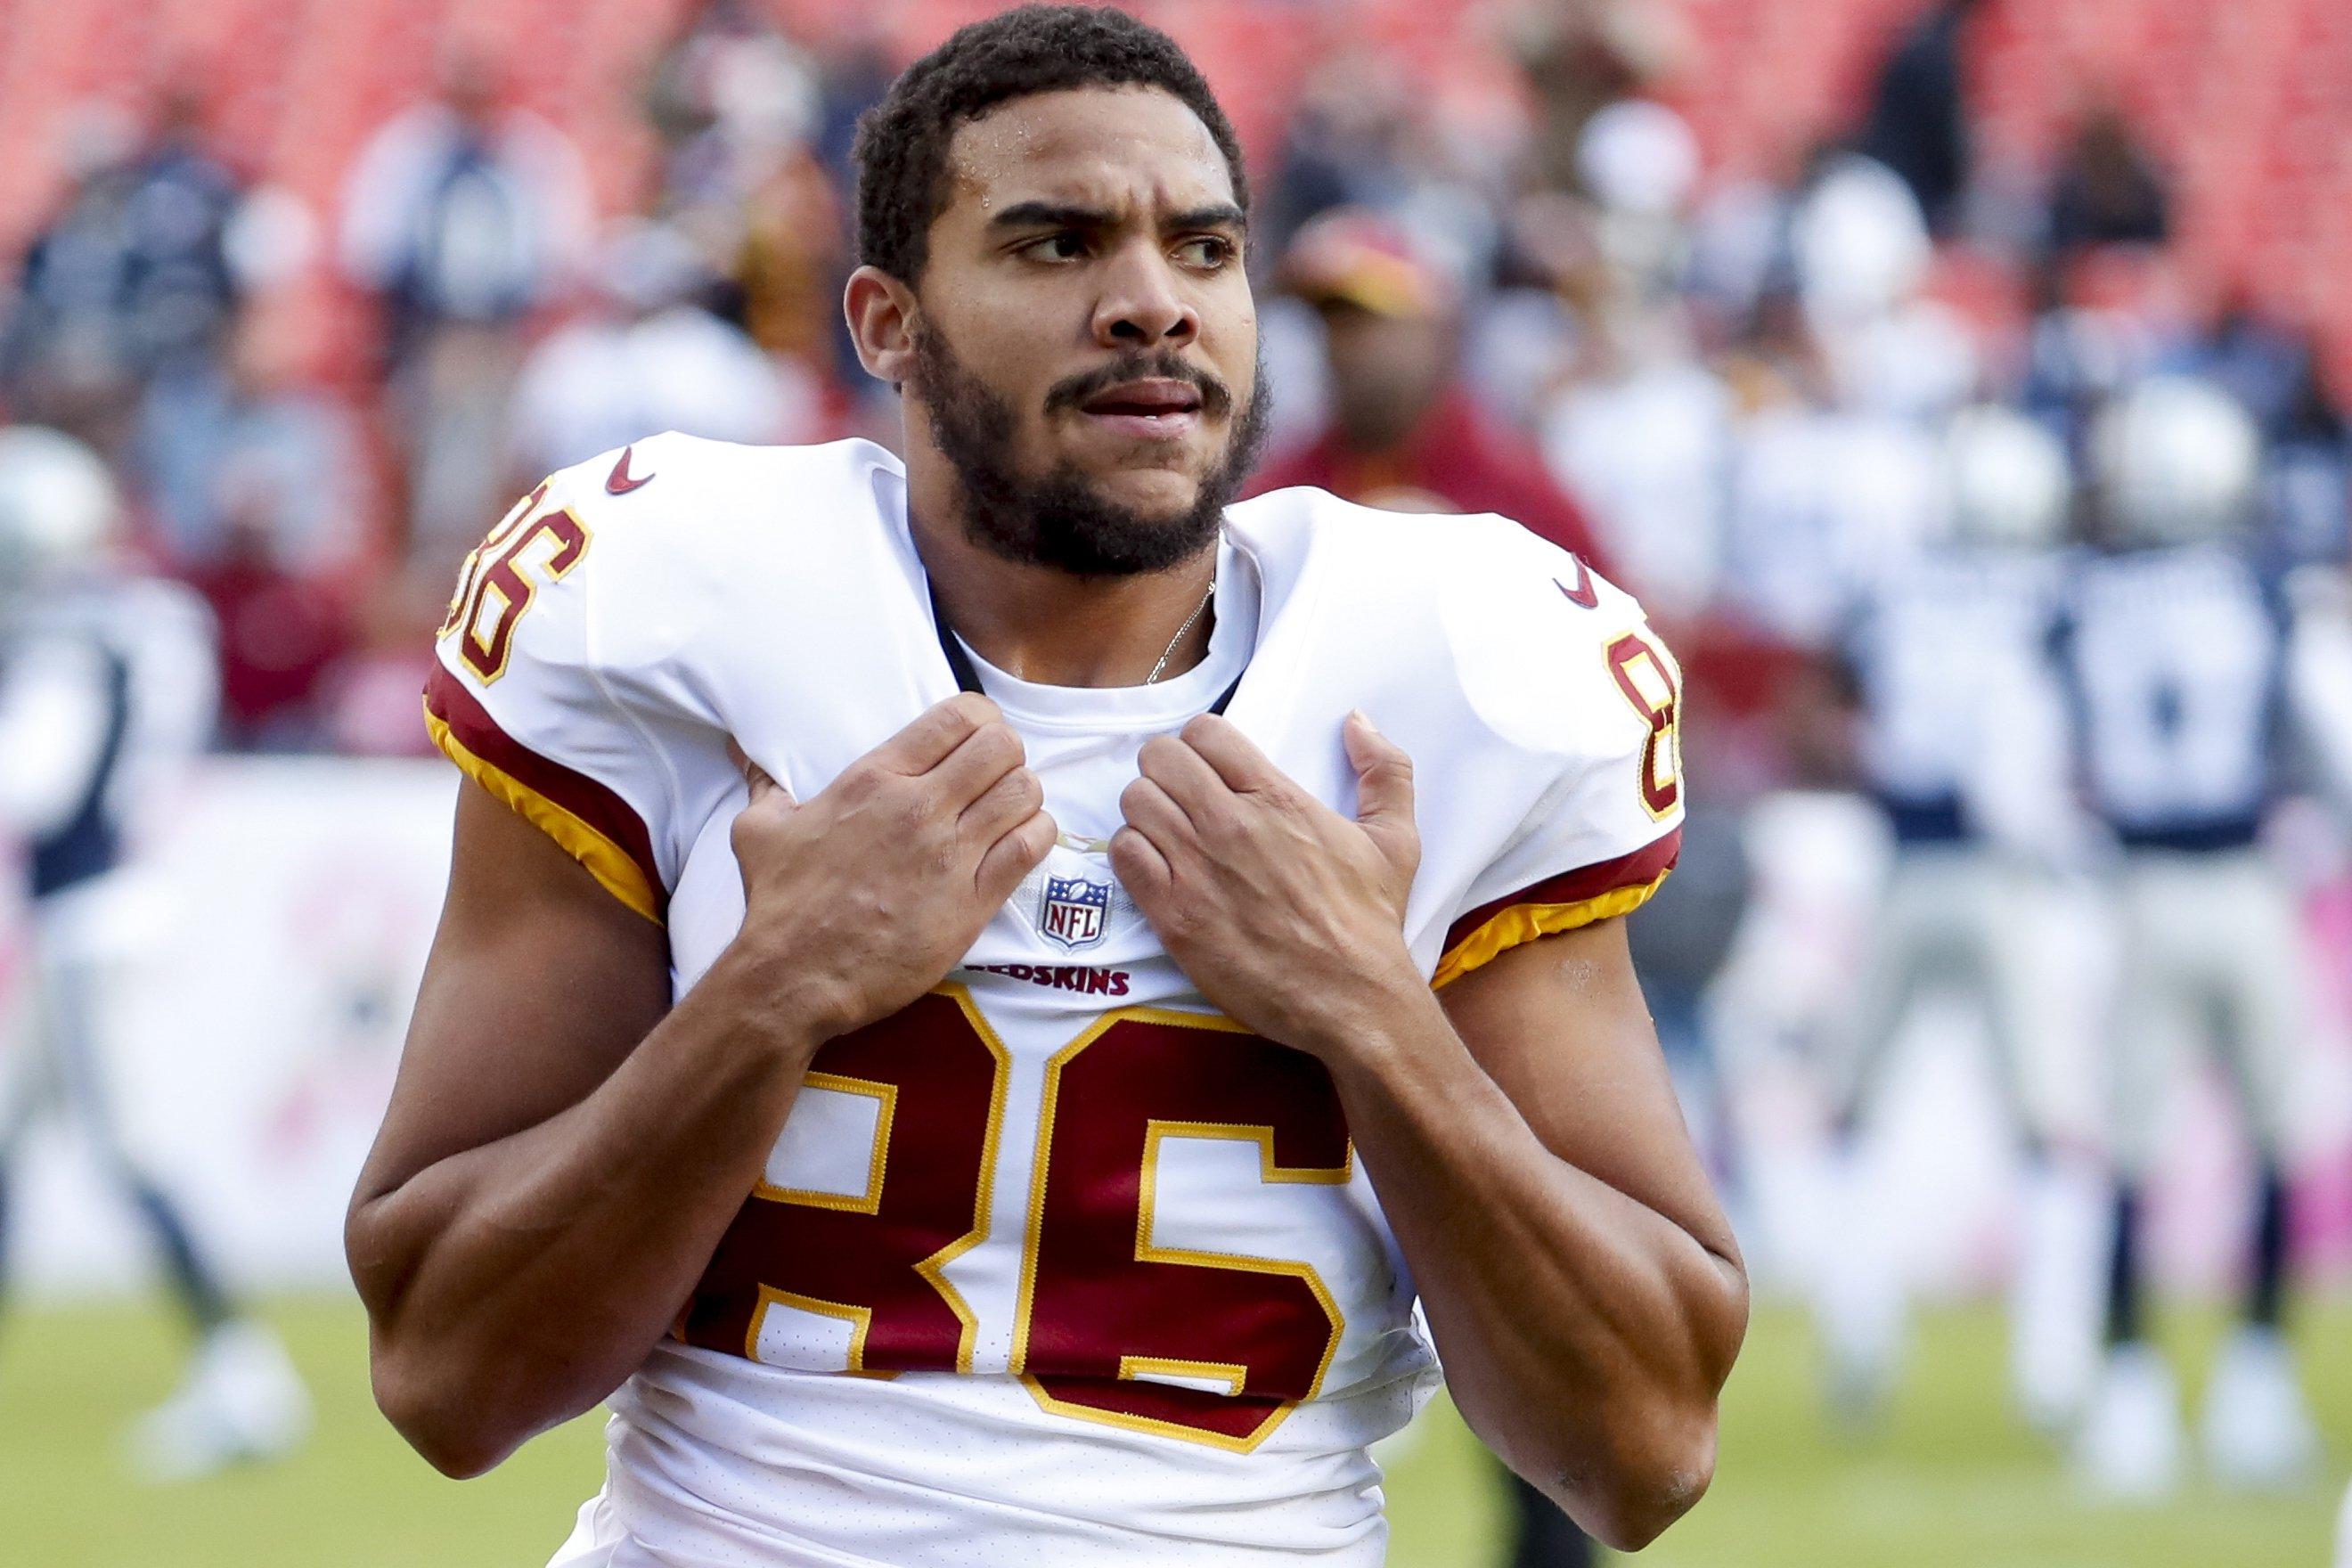 Redskins release injury-prone tight end Jordan Reed